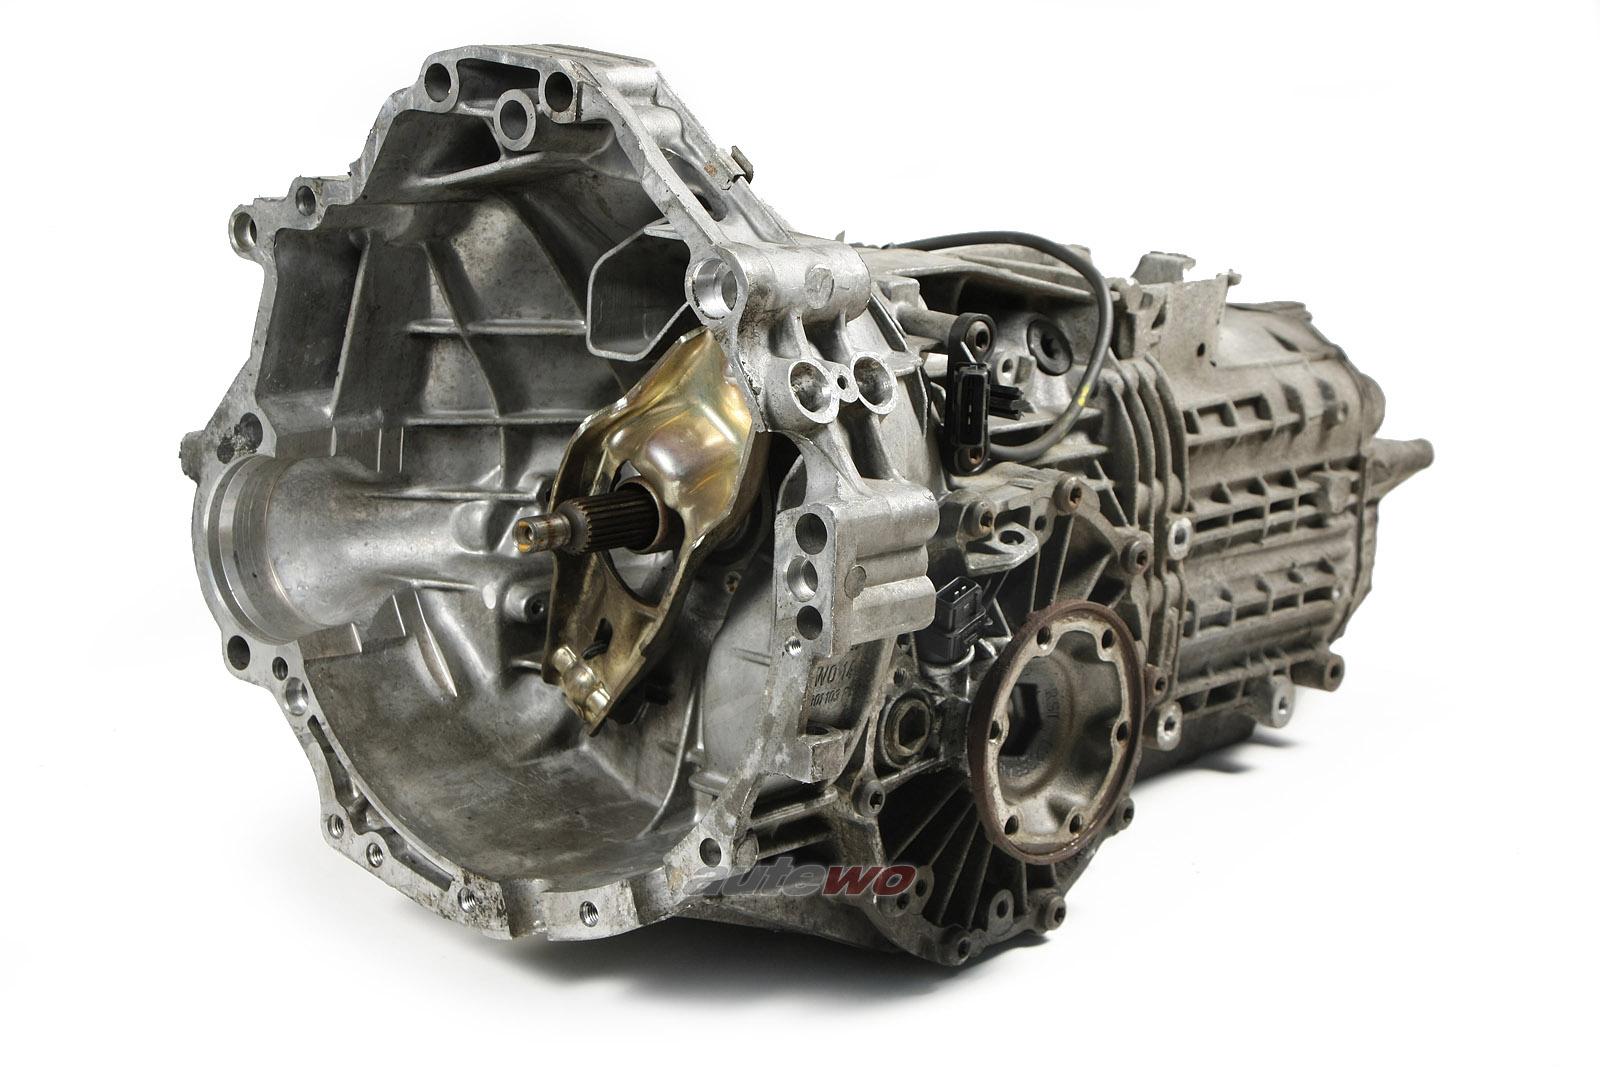 012300053CX Audi/VW 80 Typ 89 Cabrio/A4 B5/A6 C4 1.8l Schaltgetriebe DHZ 03028